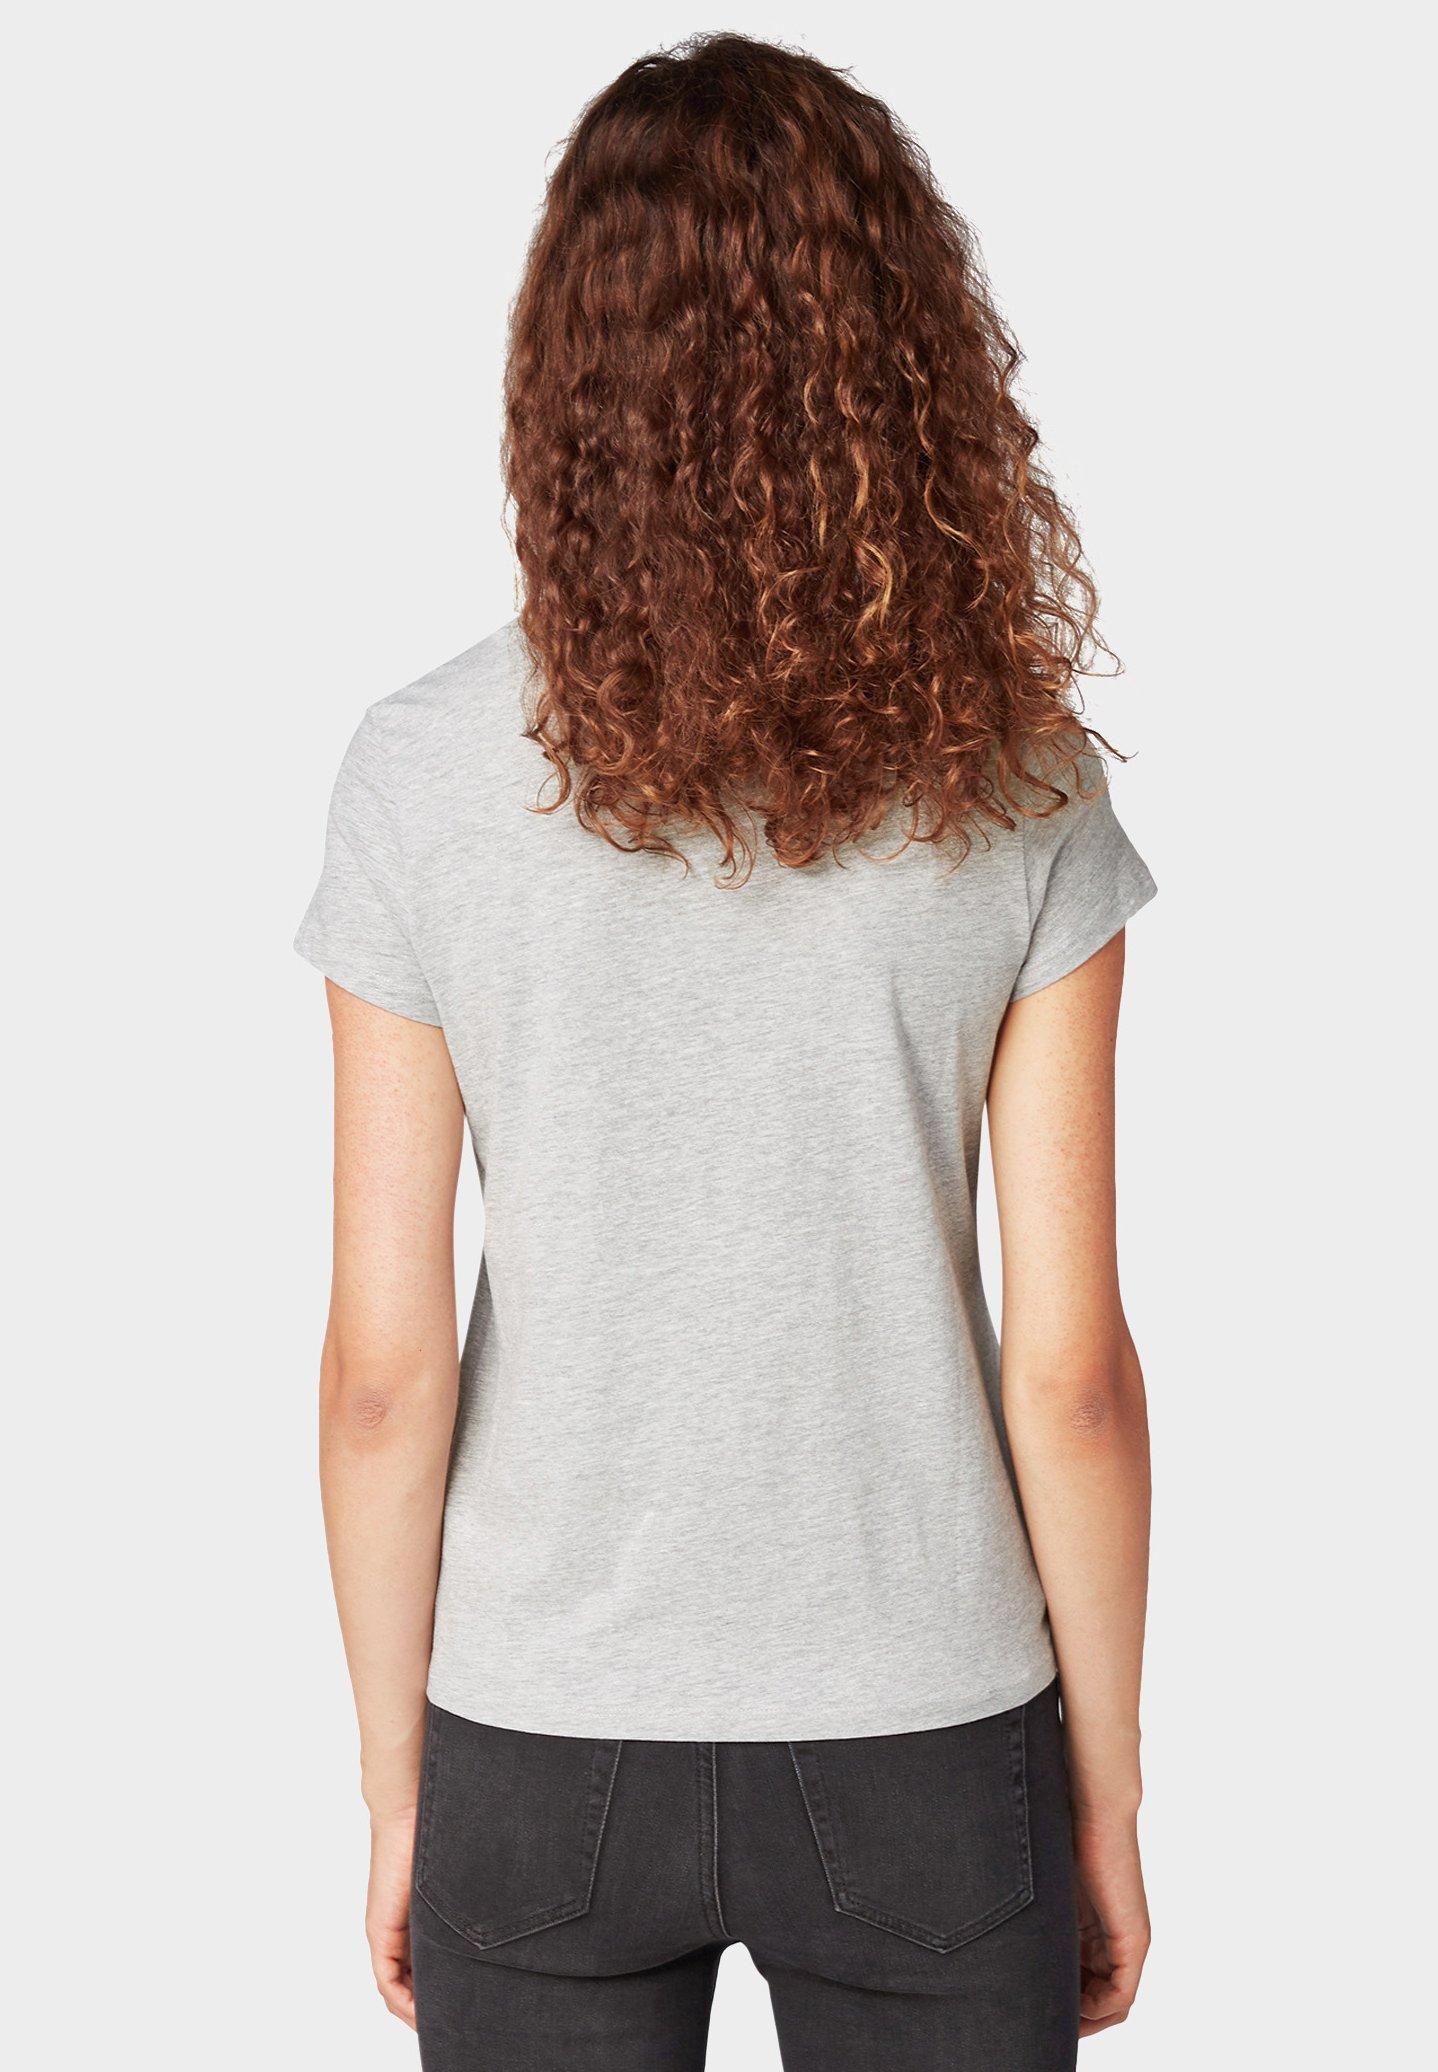 TOM TAILOR DENIM MIT SCHRIFT - T-shirt imprimé light silver grey mélange